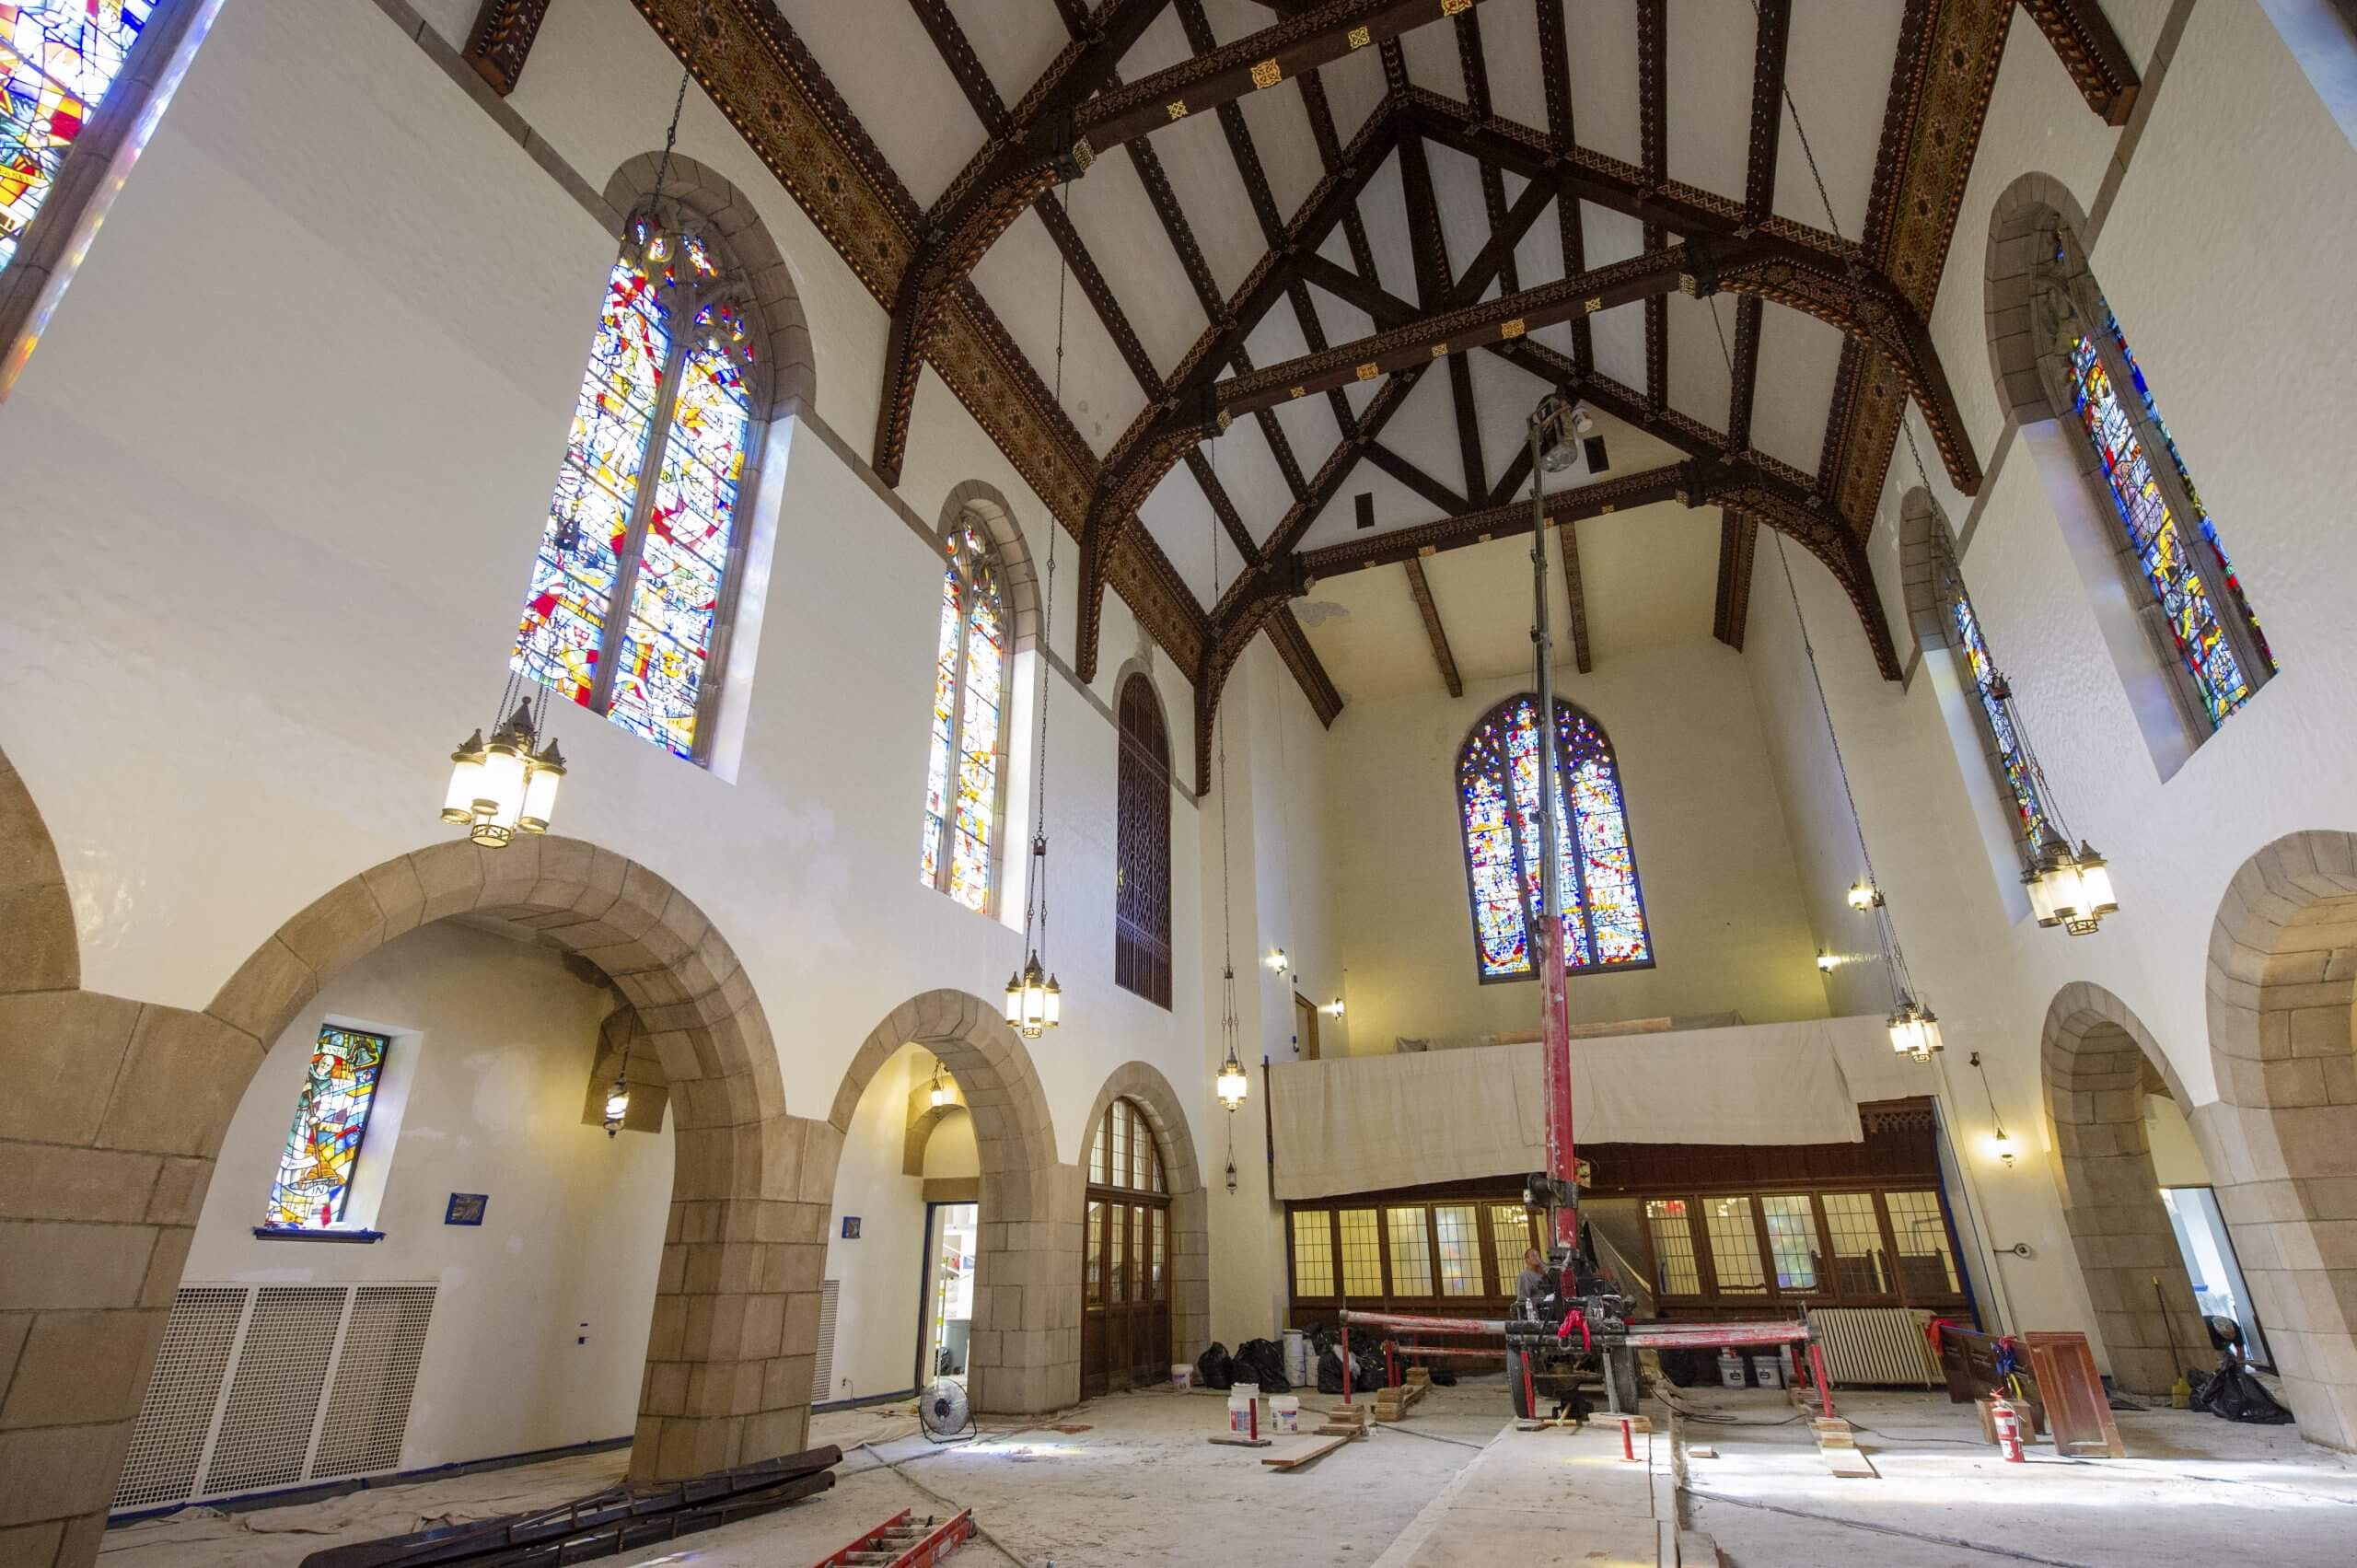 Gunnison Chapel interior during construction